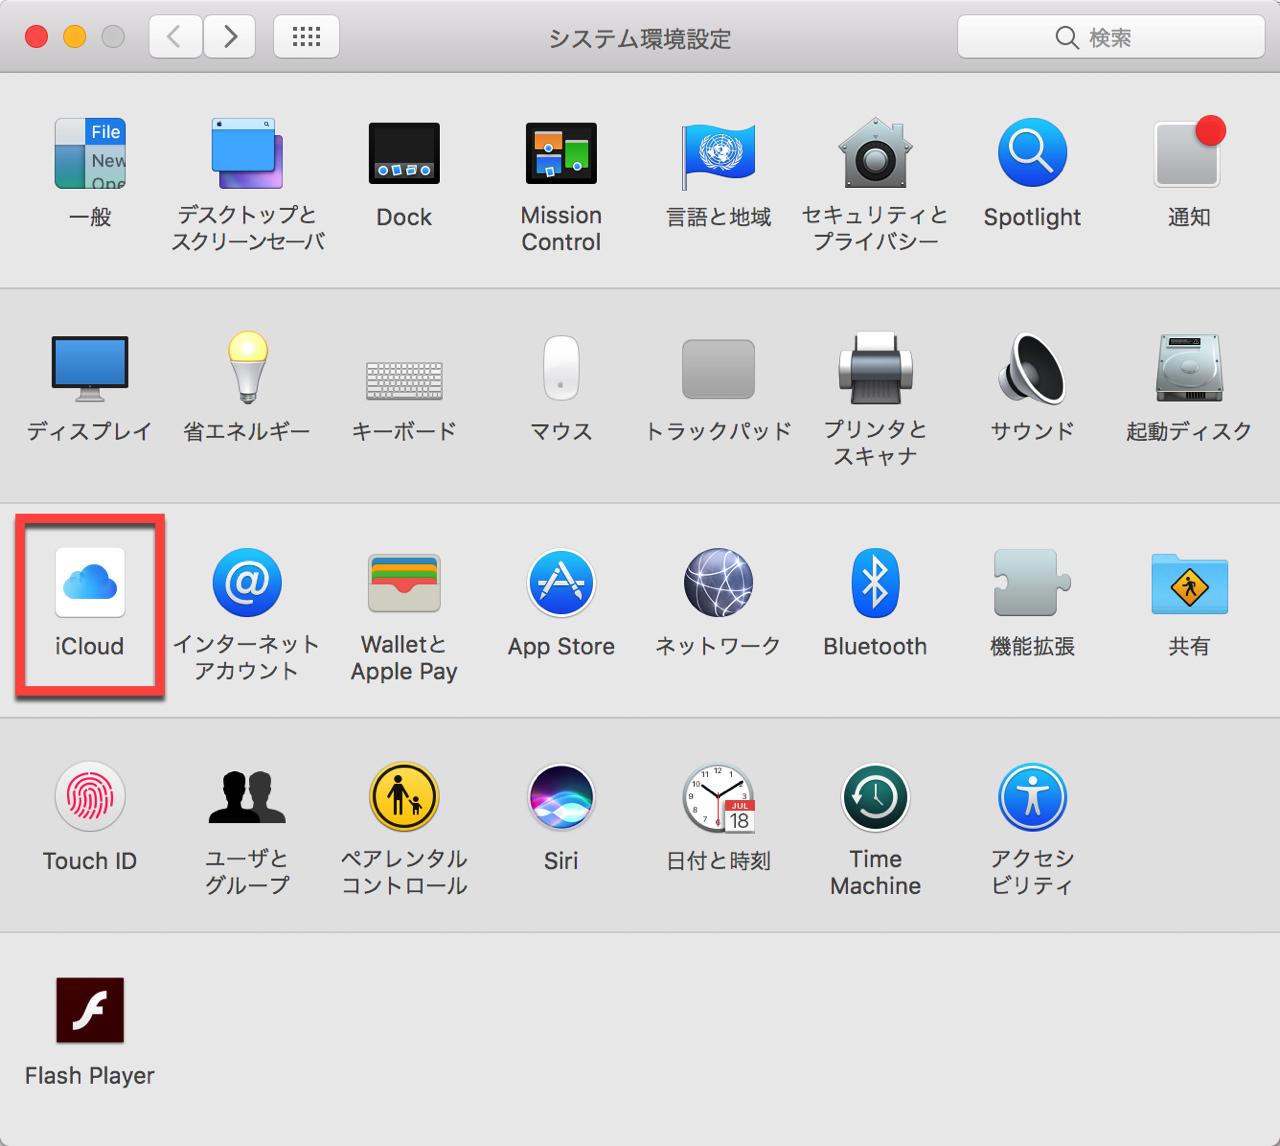 Dramatically increase storage space mac6